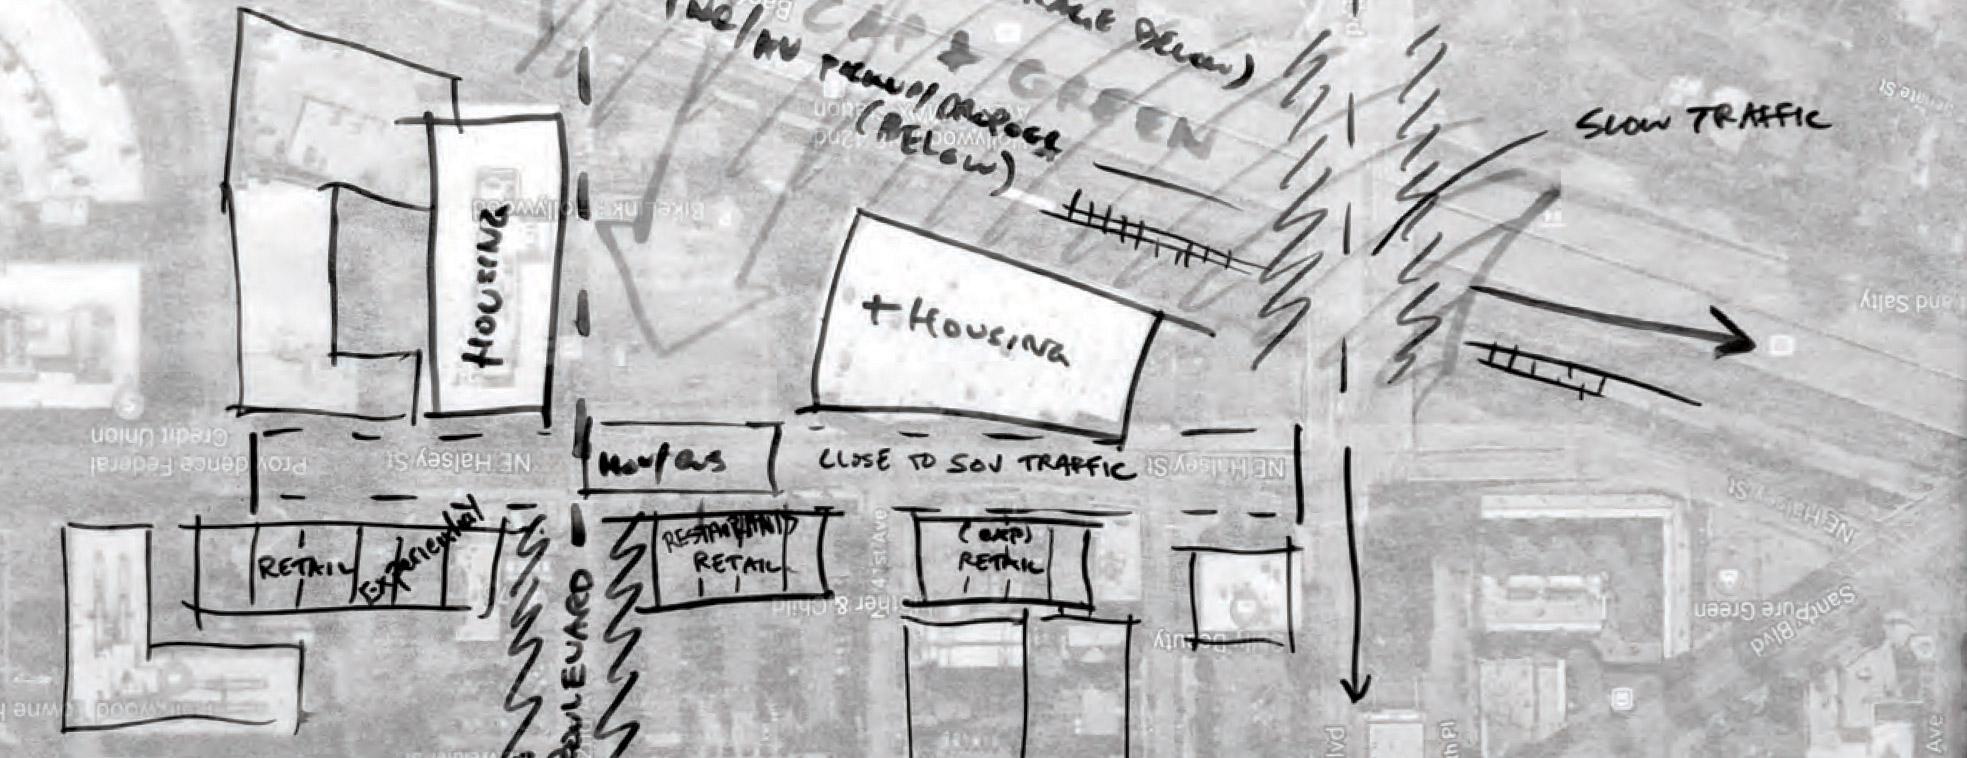 Sketch of new buildings